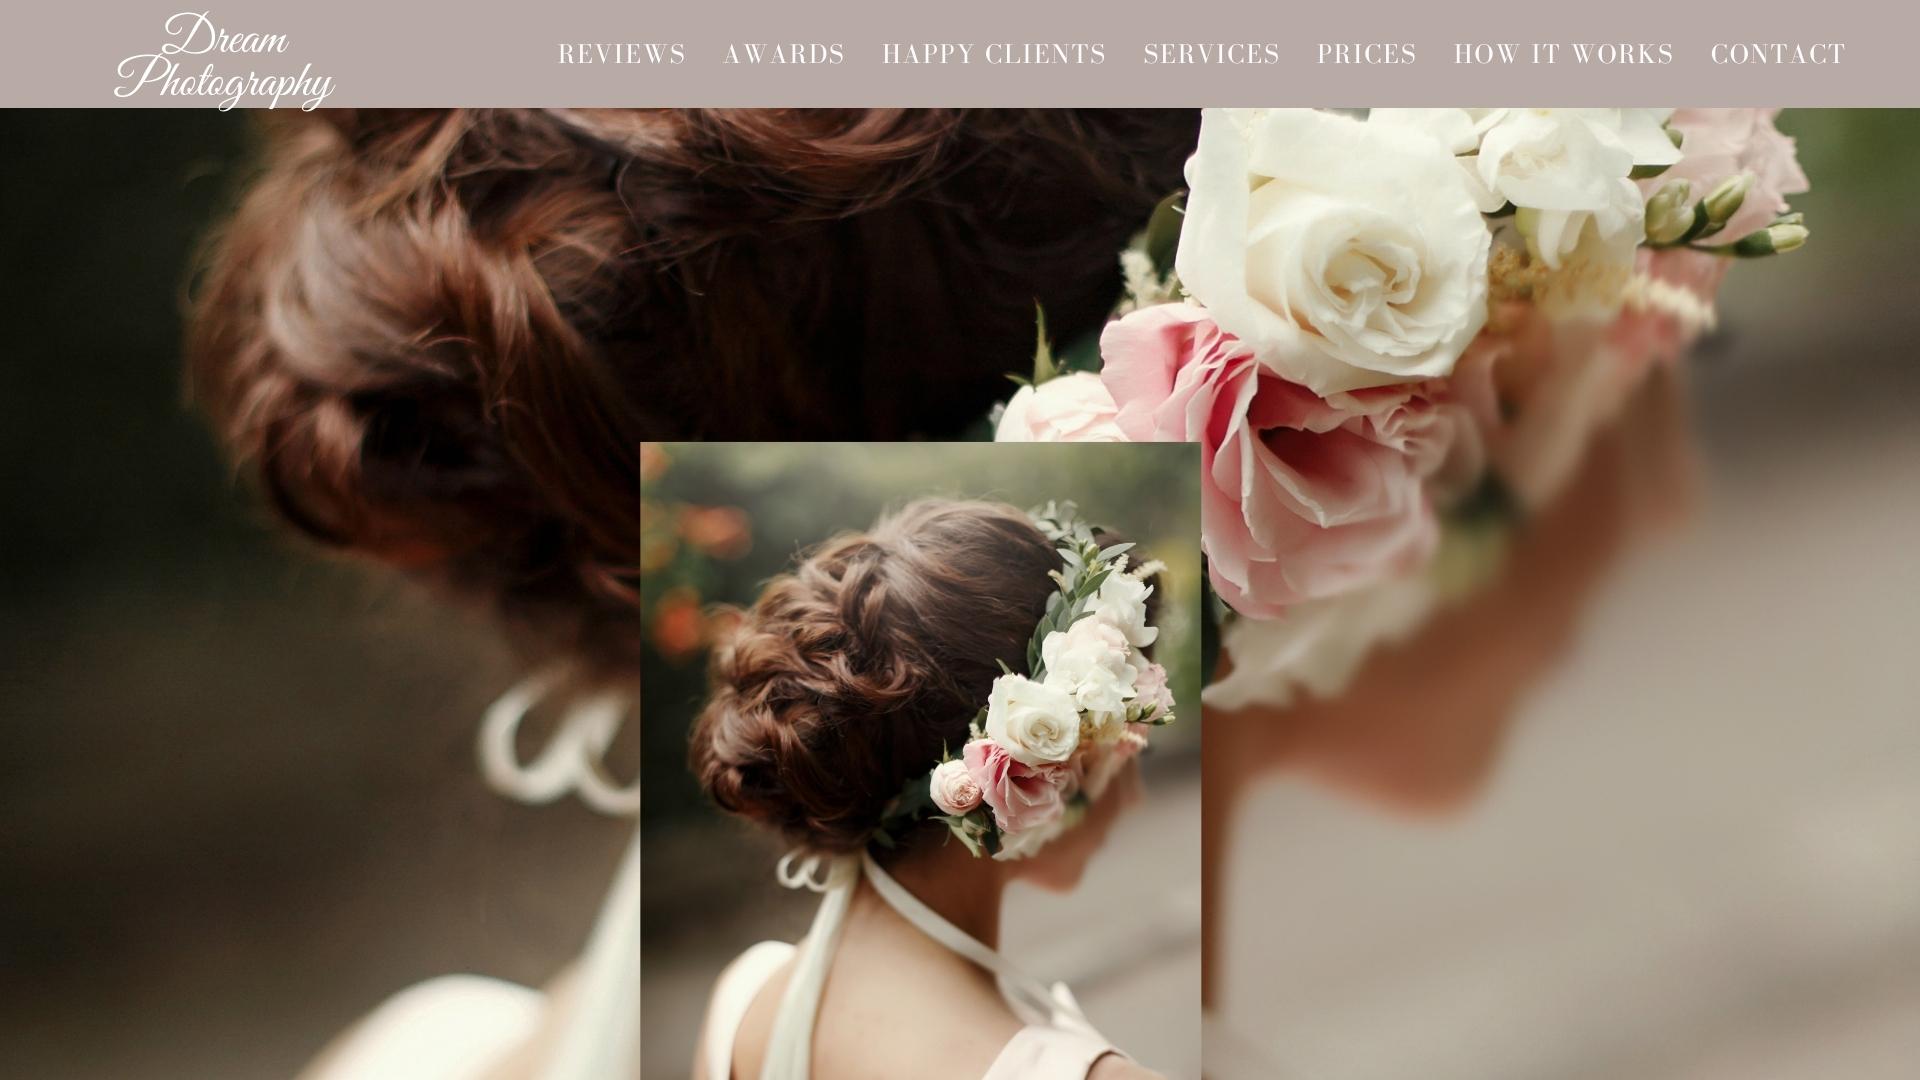 Dream Photography website